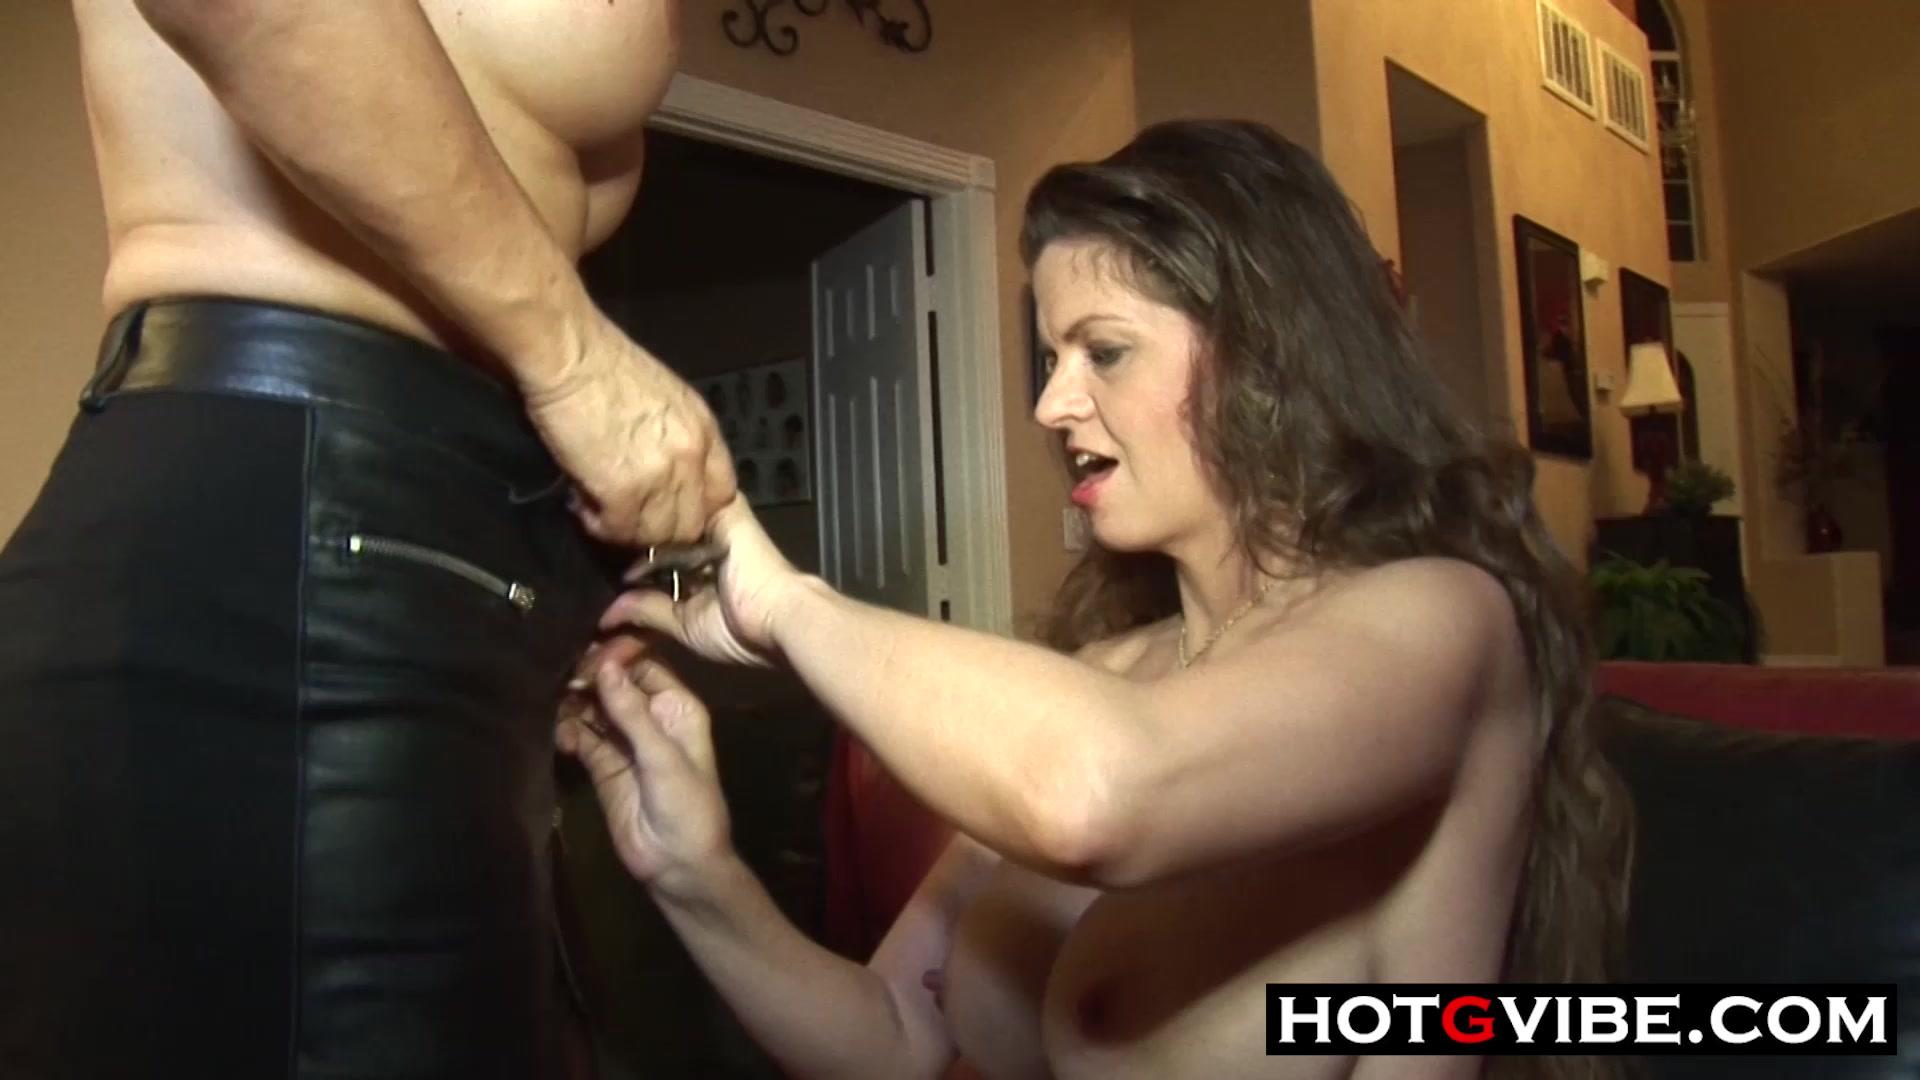 Offentlig handjob porno